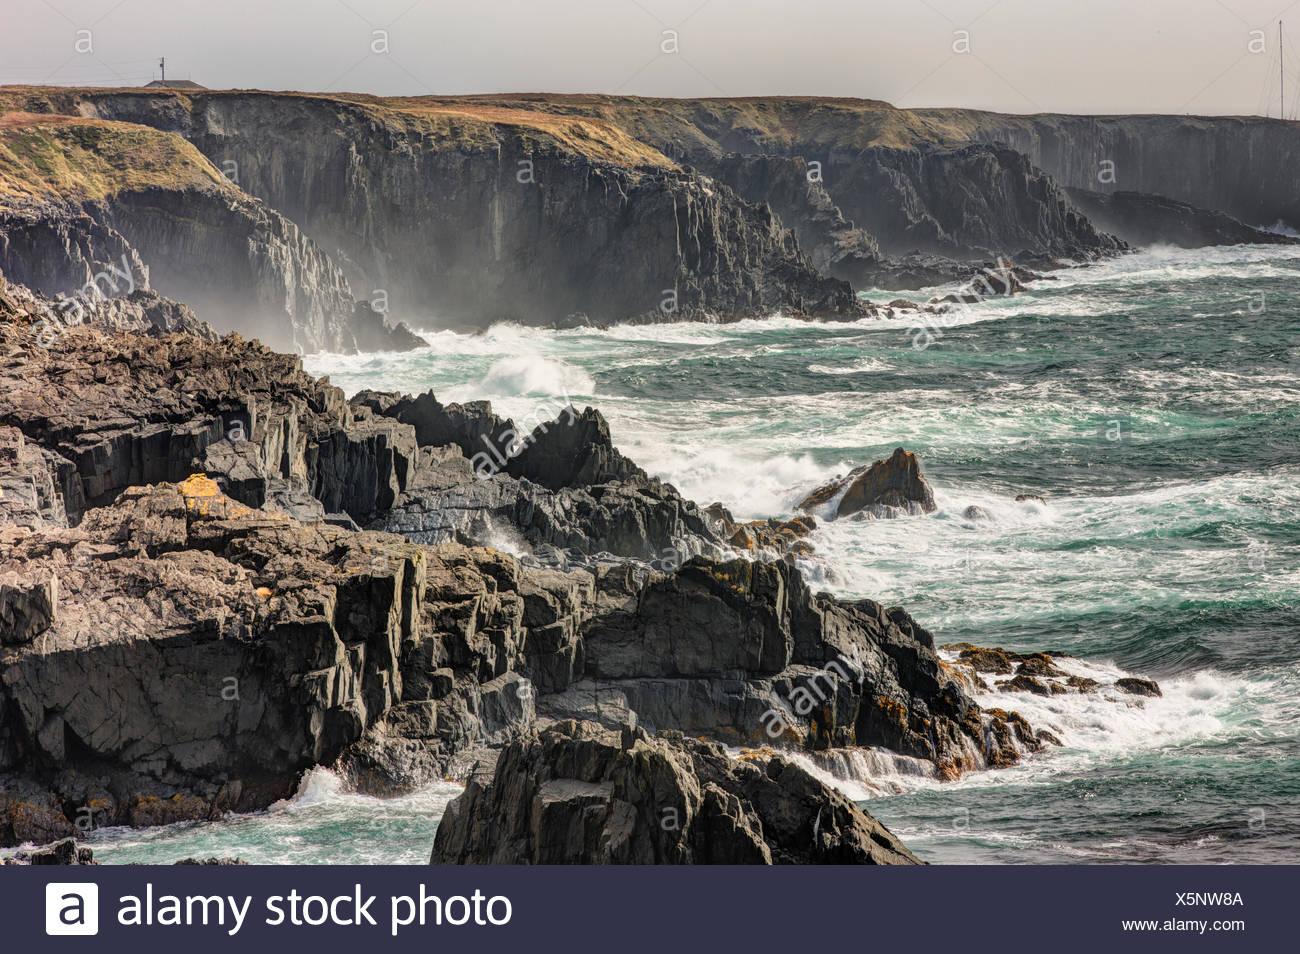 Waves breaking on coastline, Cape Race, Newfoundland, Canada - Stock Image